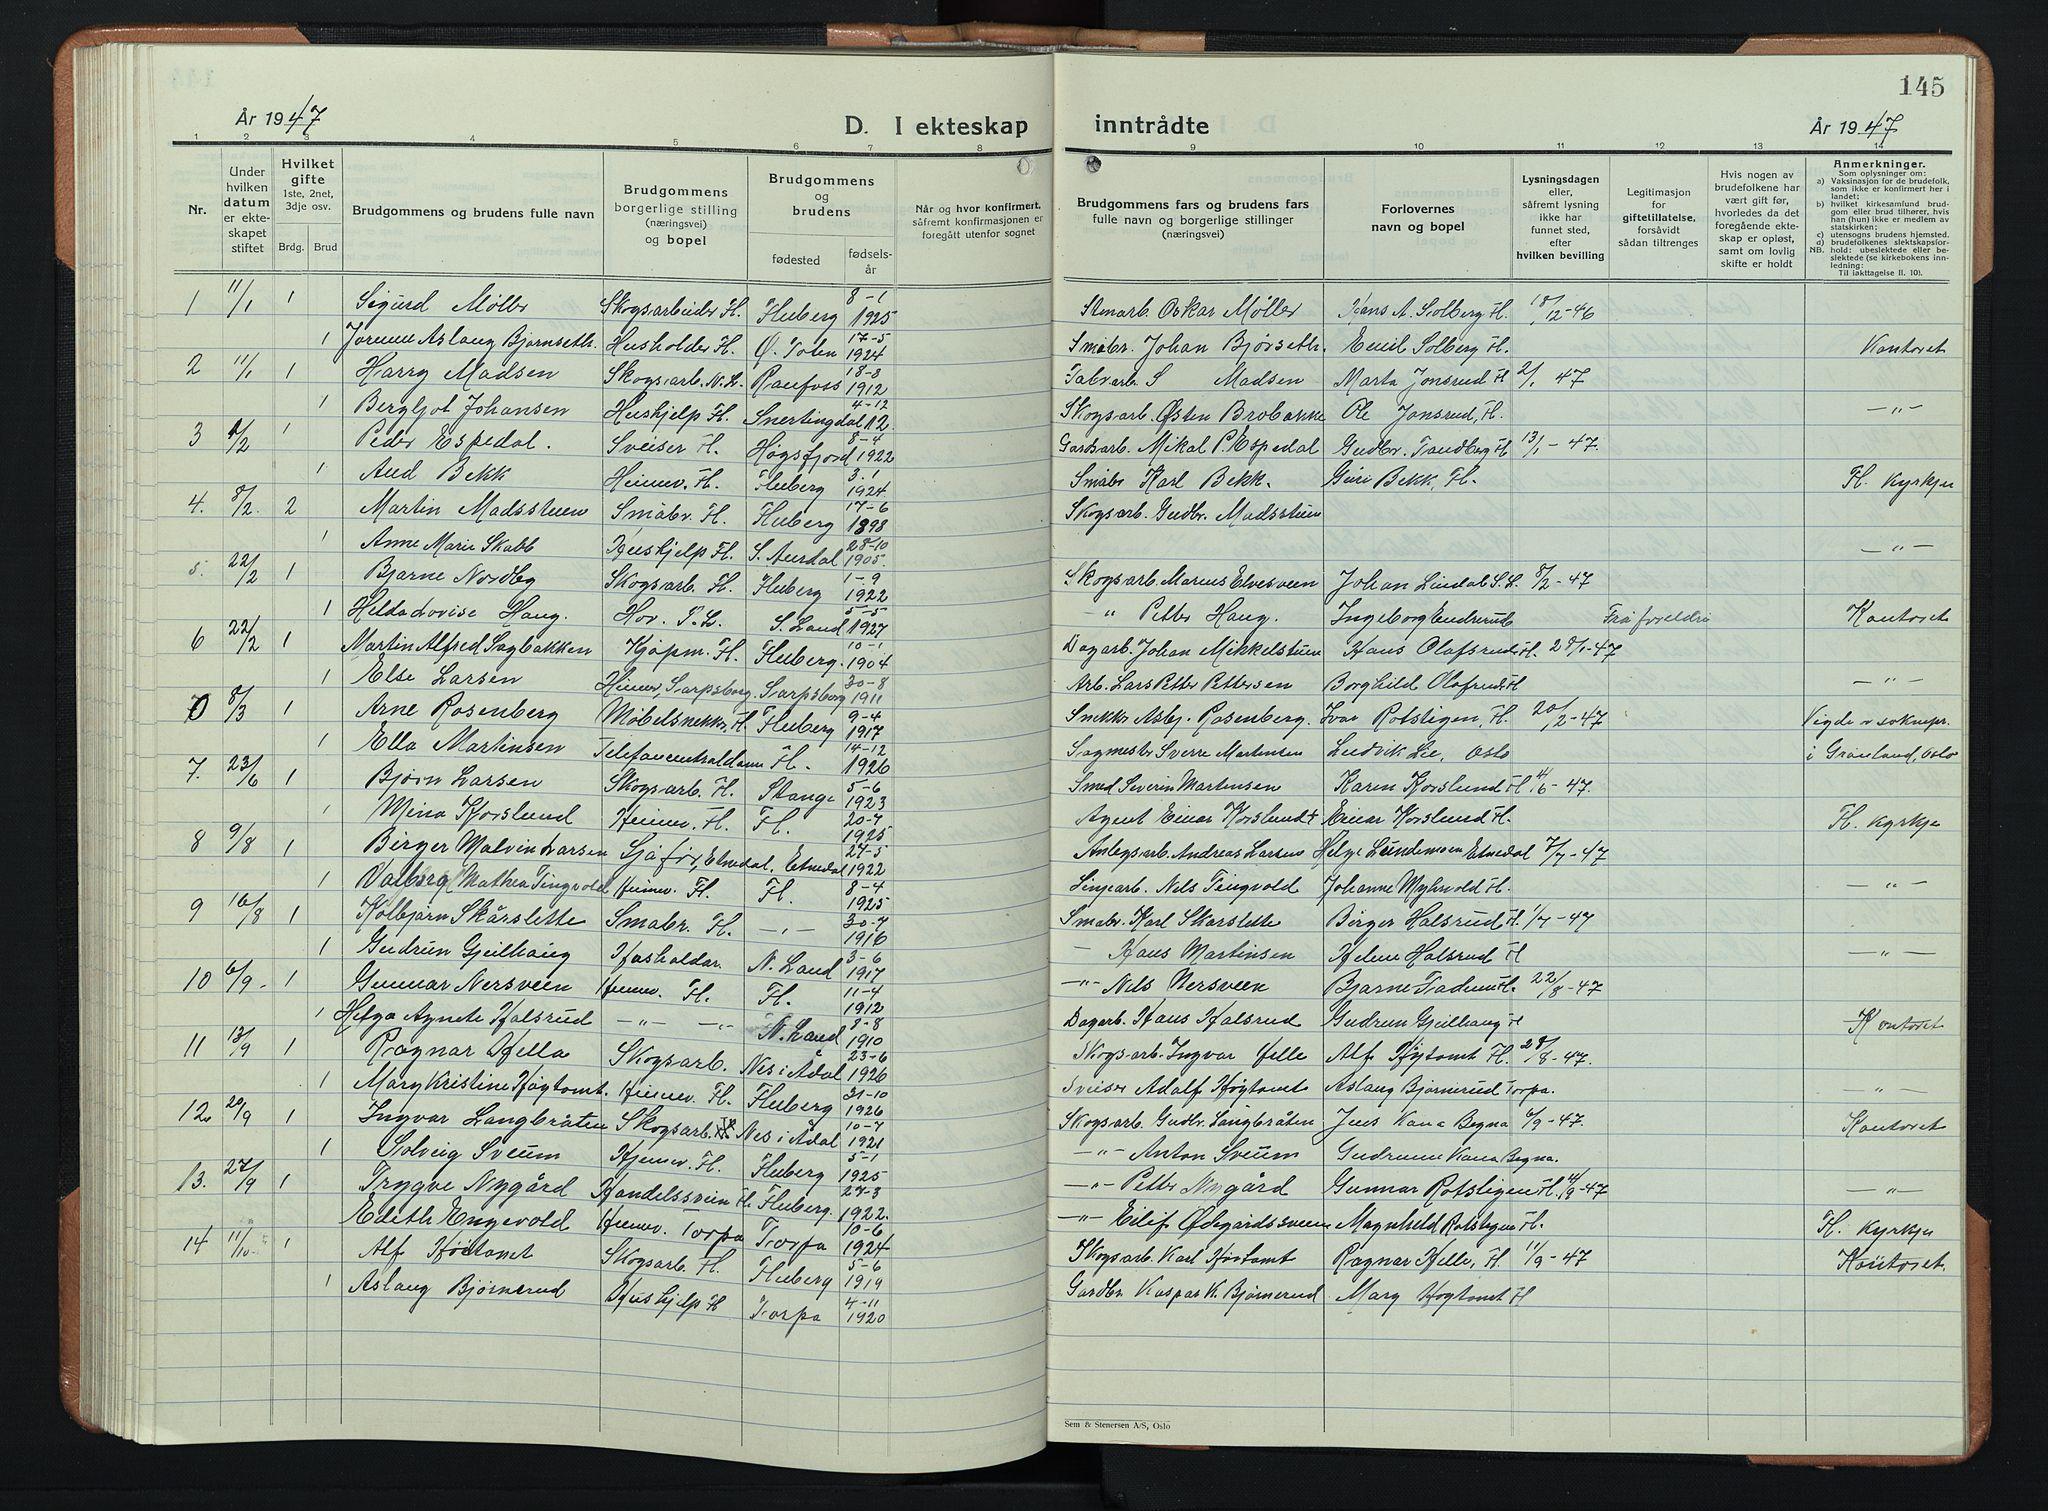 SAH, Søndre Land prestekontor, L/L0008: Klokkerbok nr. 8, 1926-1950, s. 145